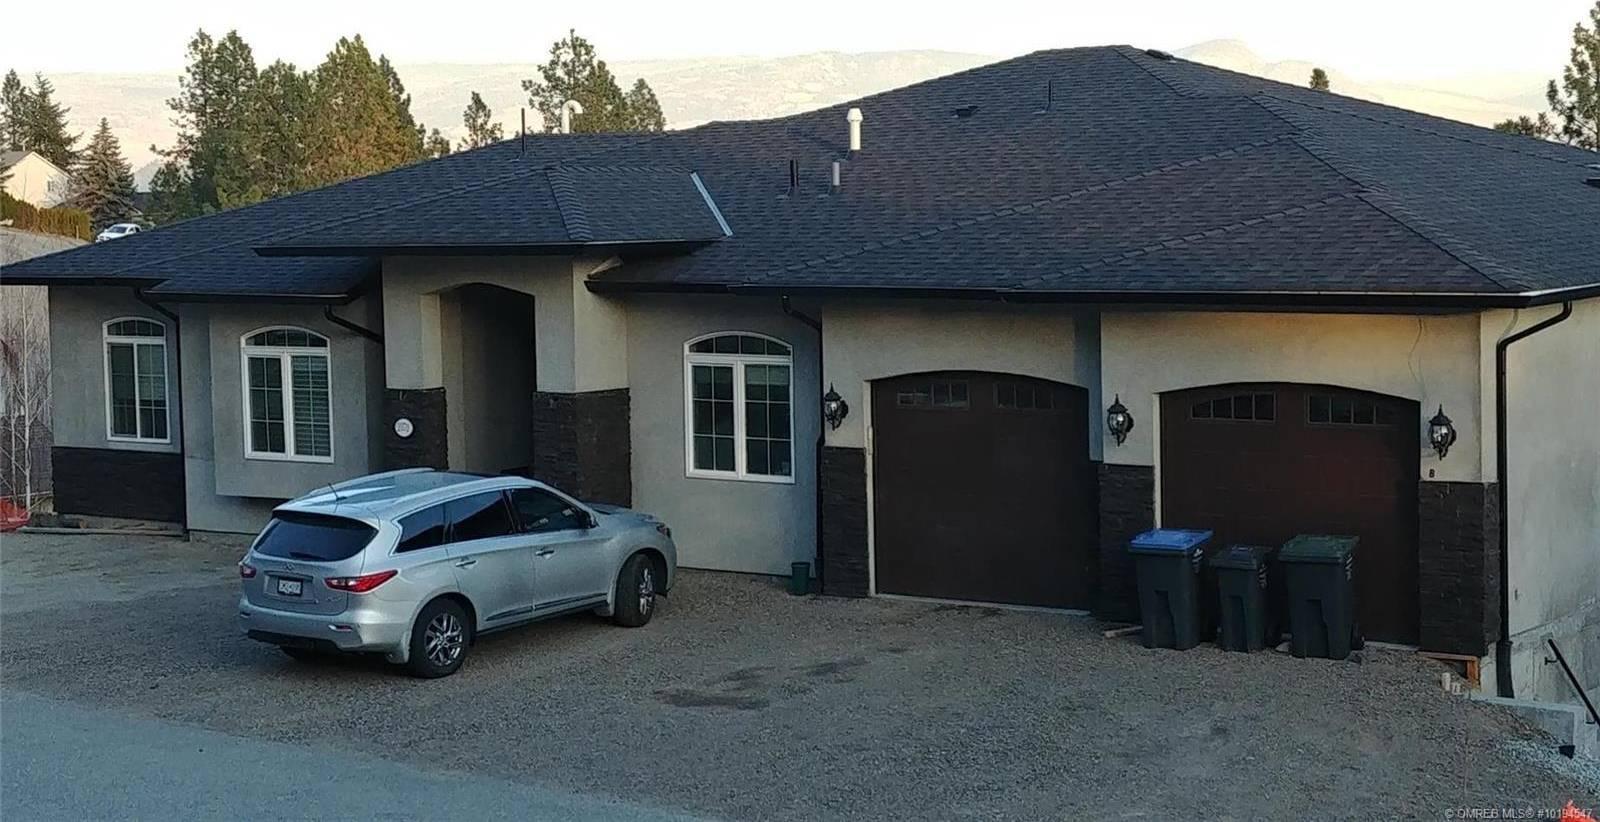 House for sale at 2070 Horizon Dr West Kelowna British Columbia - MLS: 10194547